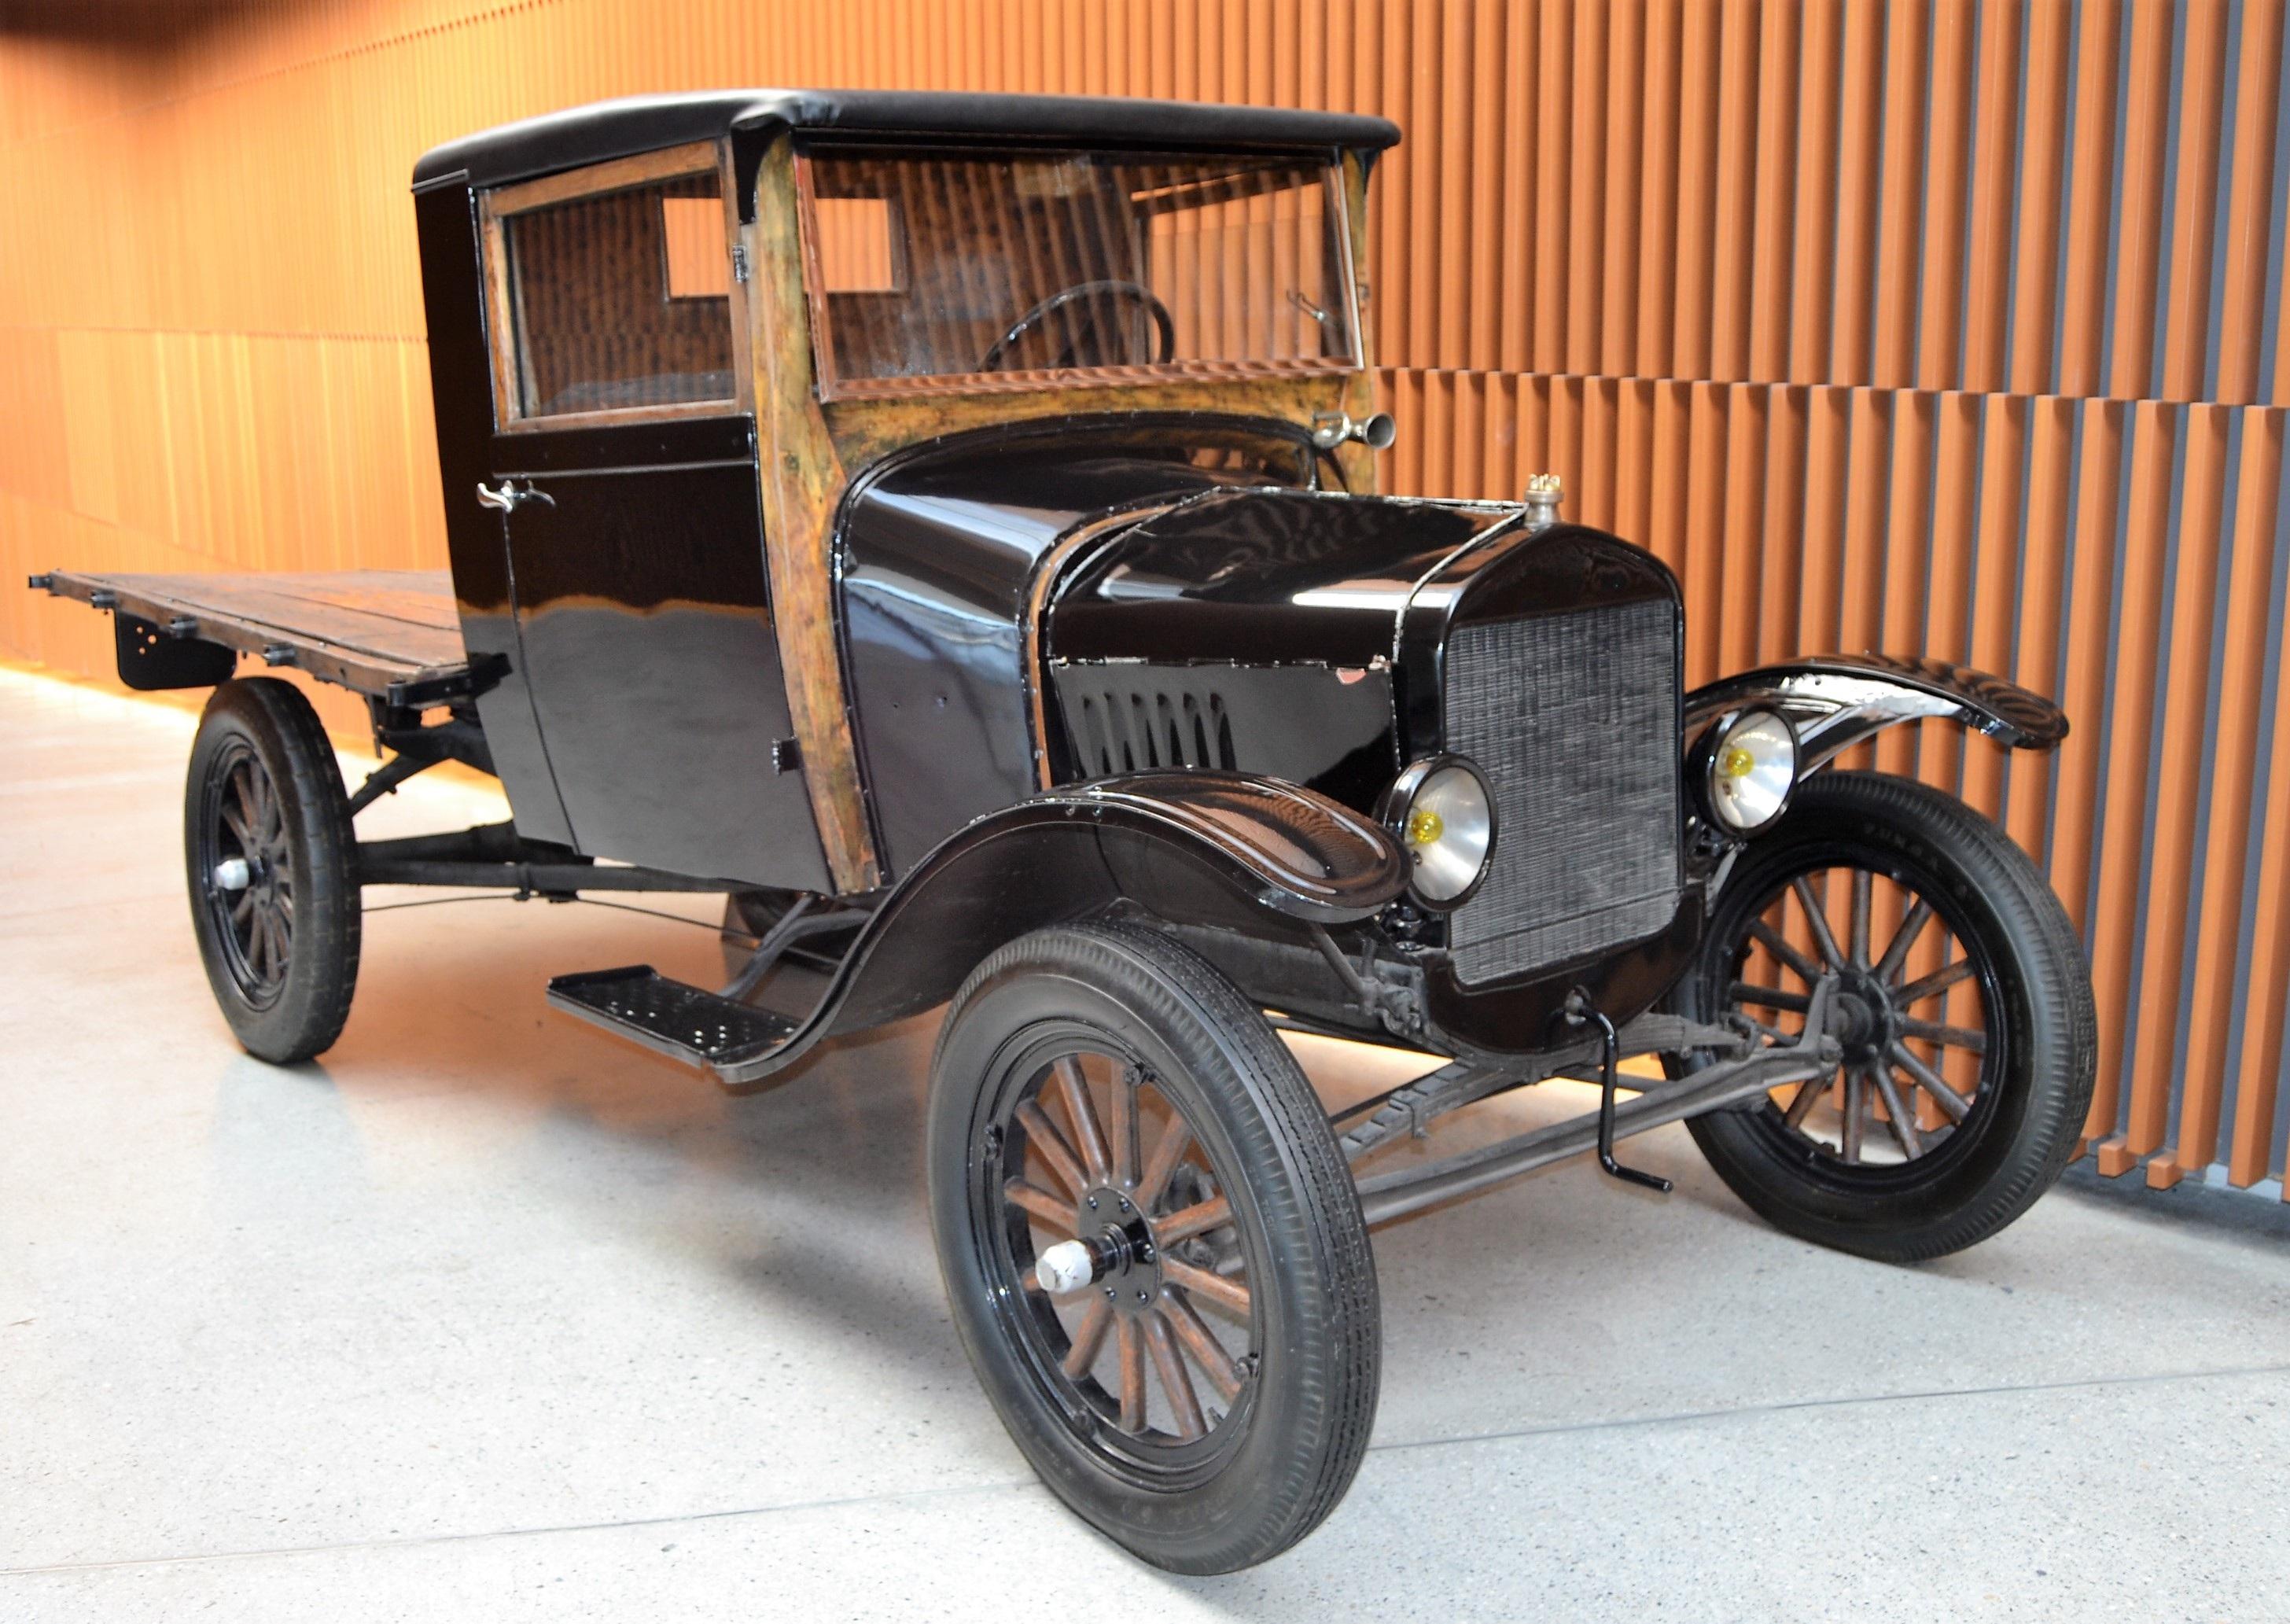 Free Images : wheel, classic car, motor vehicle, vintage car ...